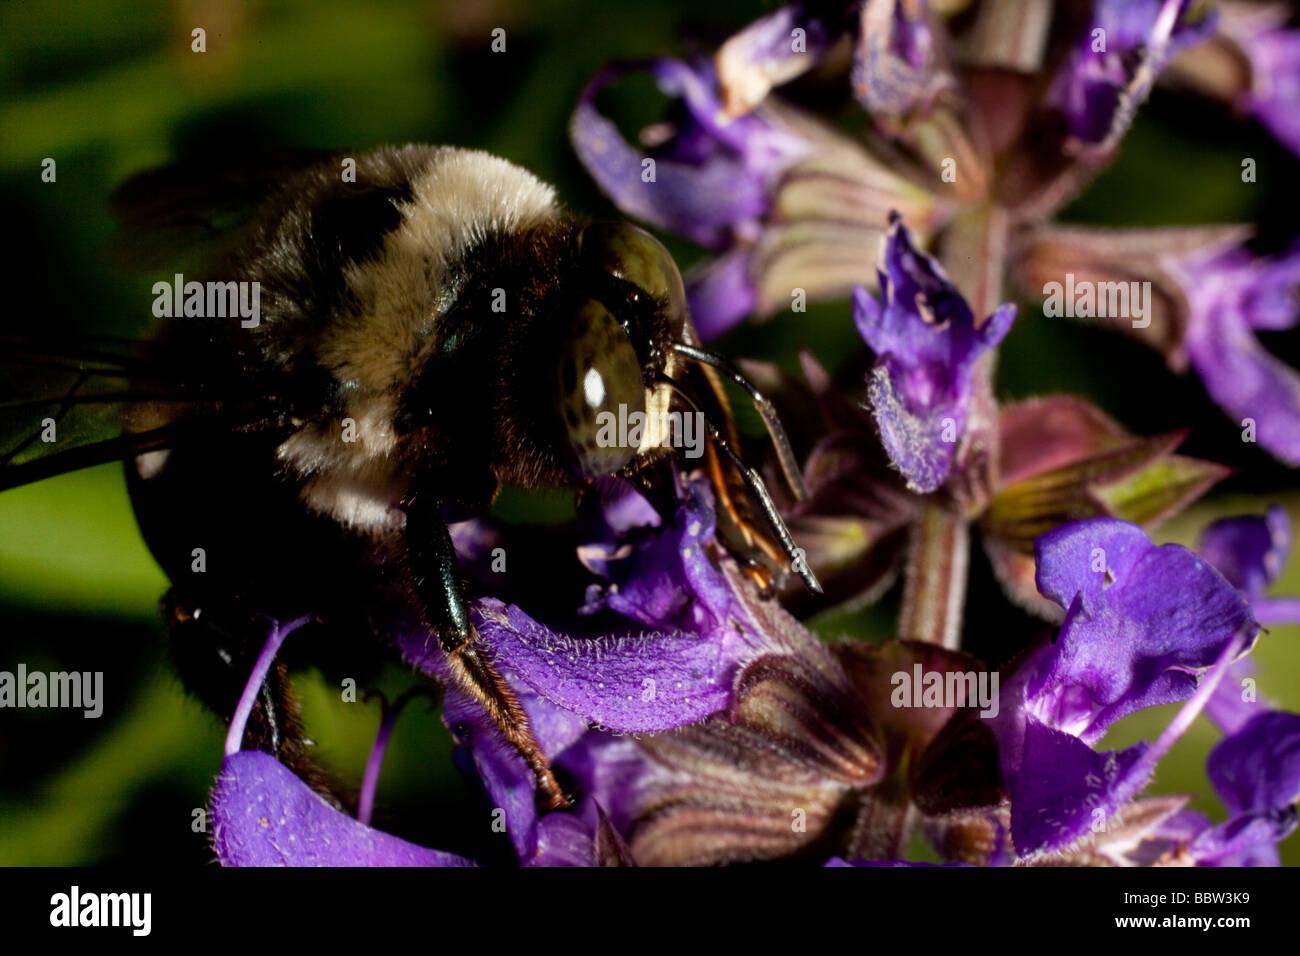 Bee Gathering Pollen On Silvia Flowers   Stock Image